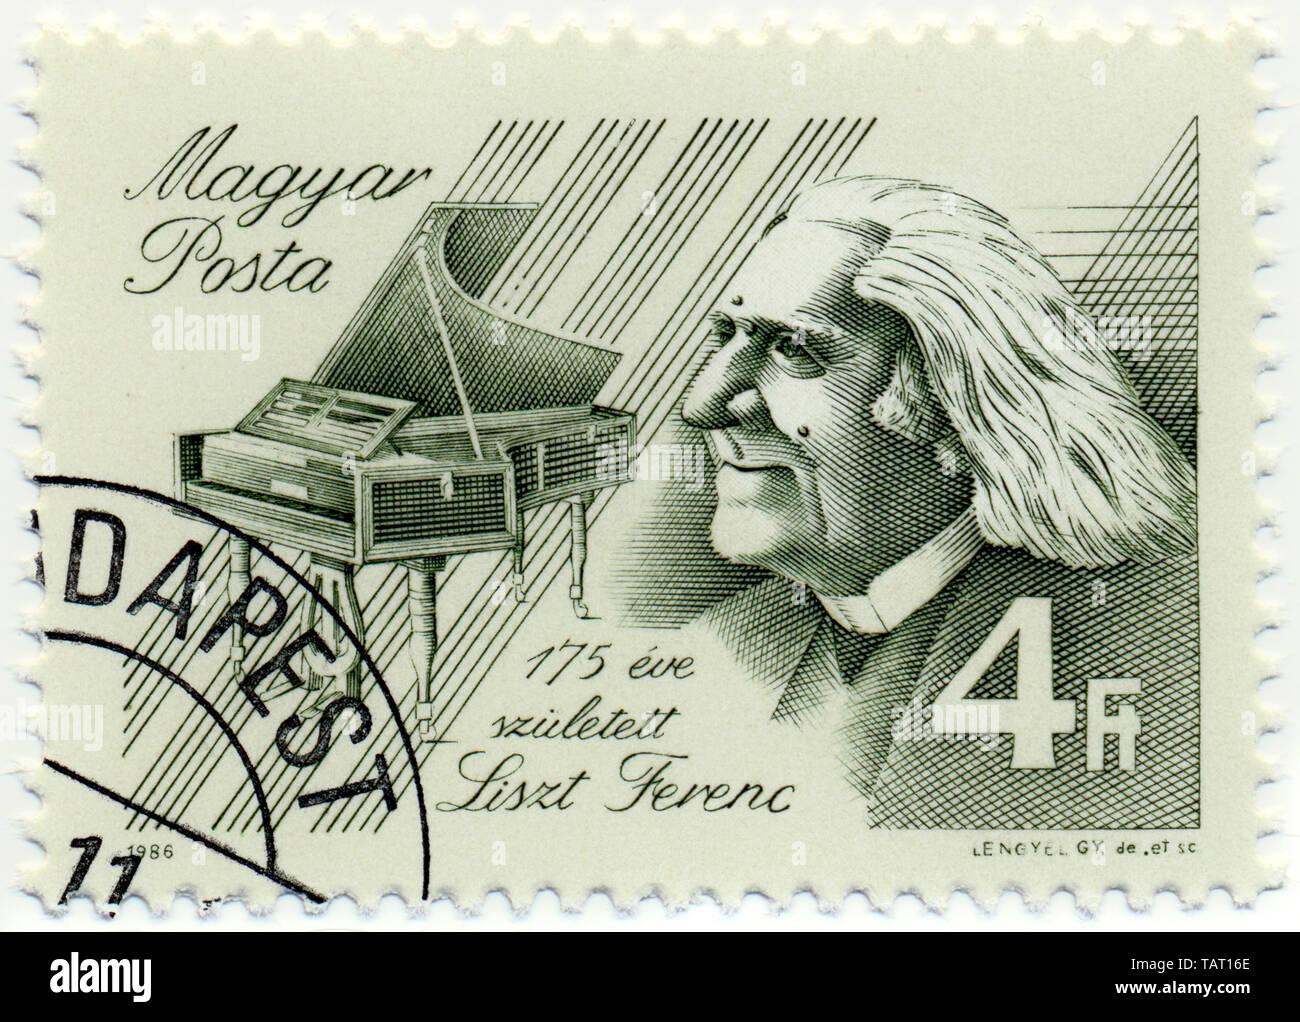 Historic postage stamps from Hungary, Historische Briefmarke, Franz Liszt, 1986, Ungarn, Europa Stock Photo